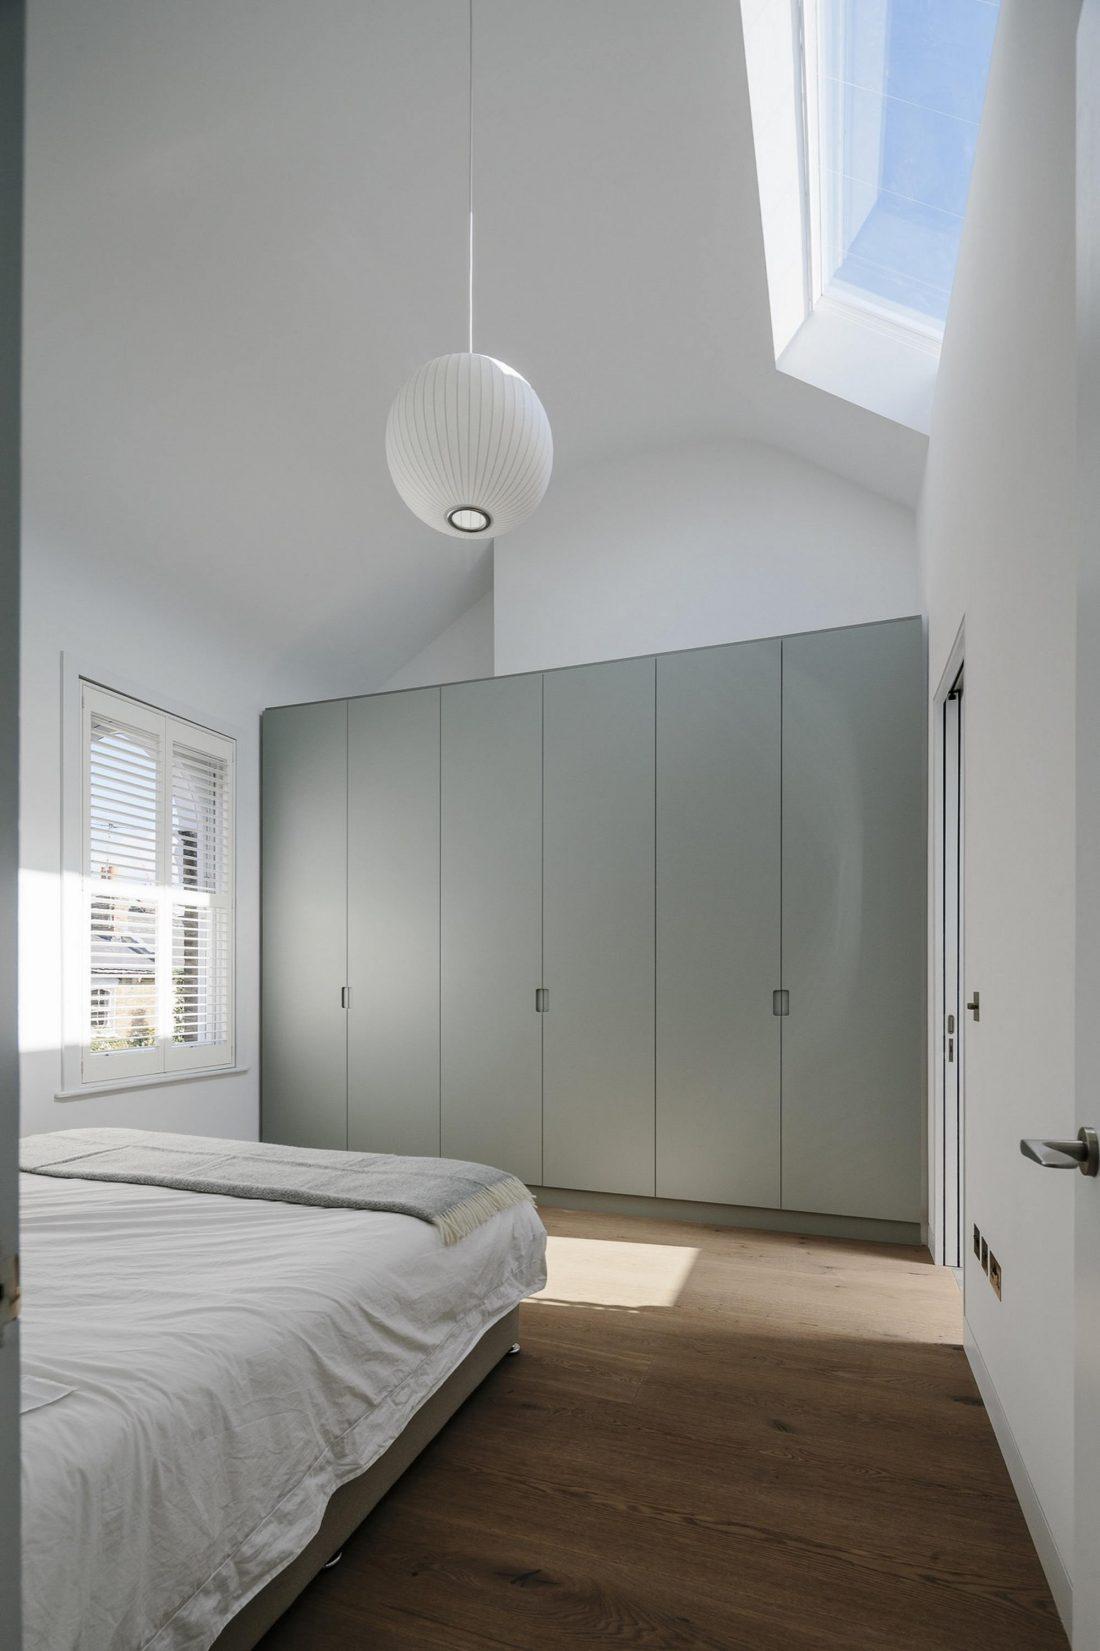 Дом Брекенбури от студии Neil Dusheiko Architects 4